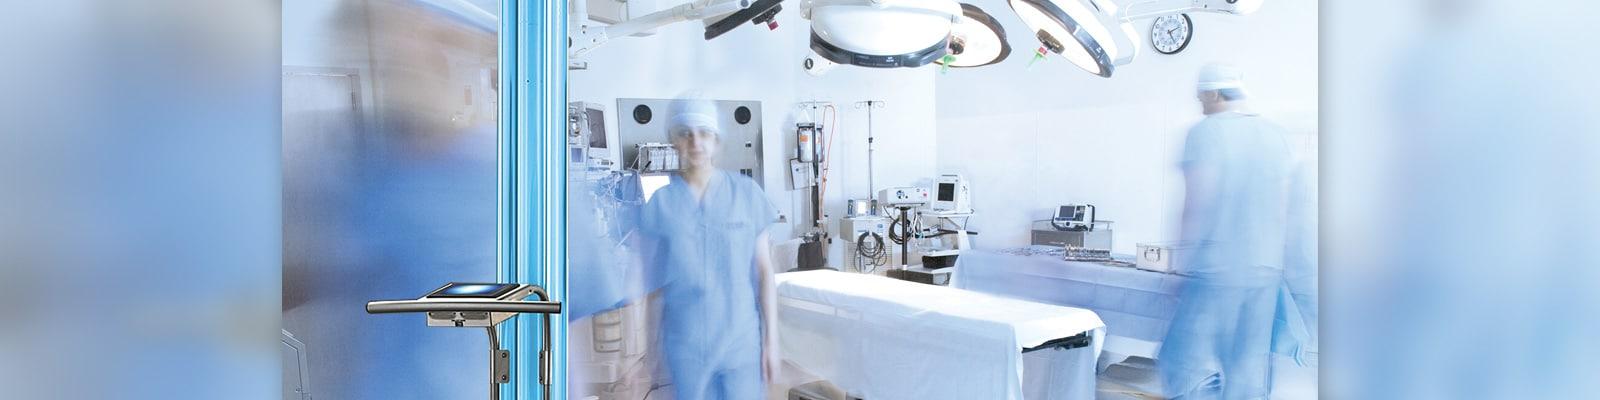 Disinfection Medical Schein Ultraviolet System Henry 34RcjAL5q